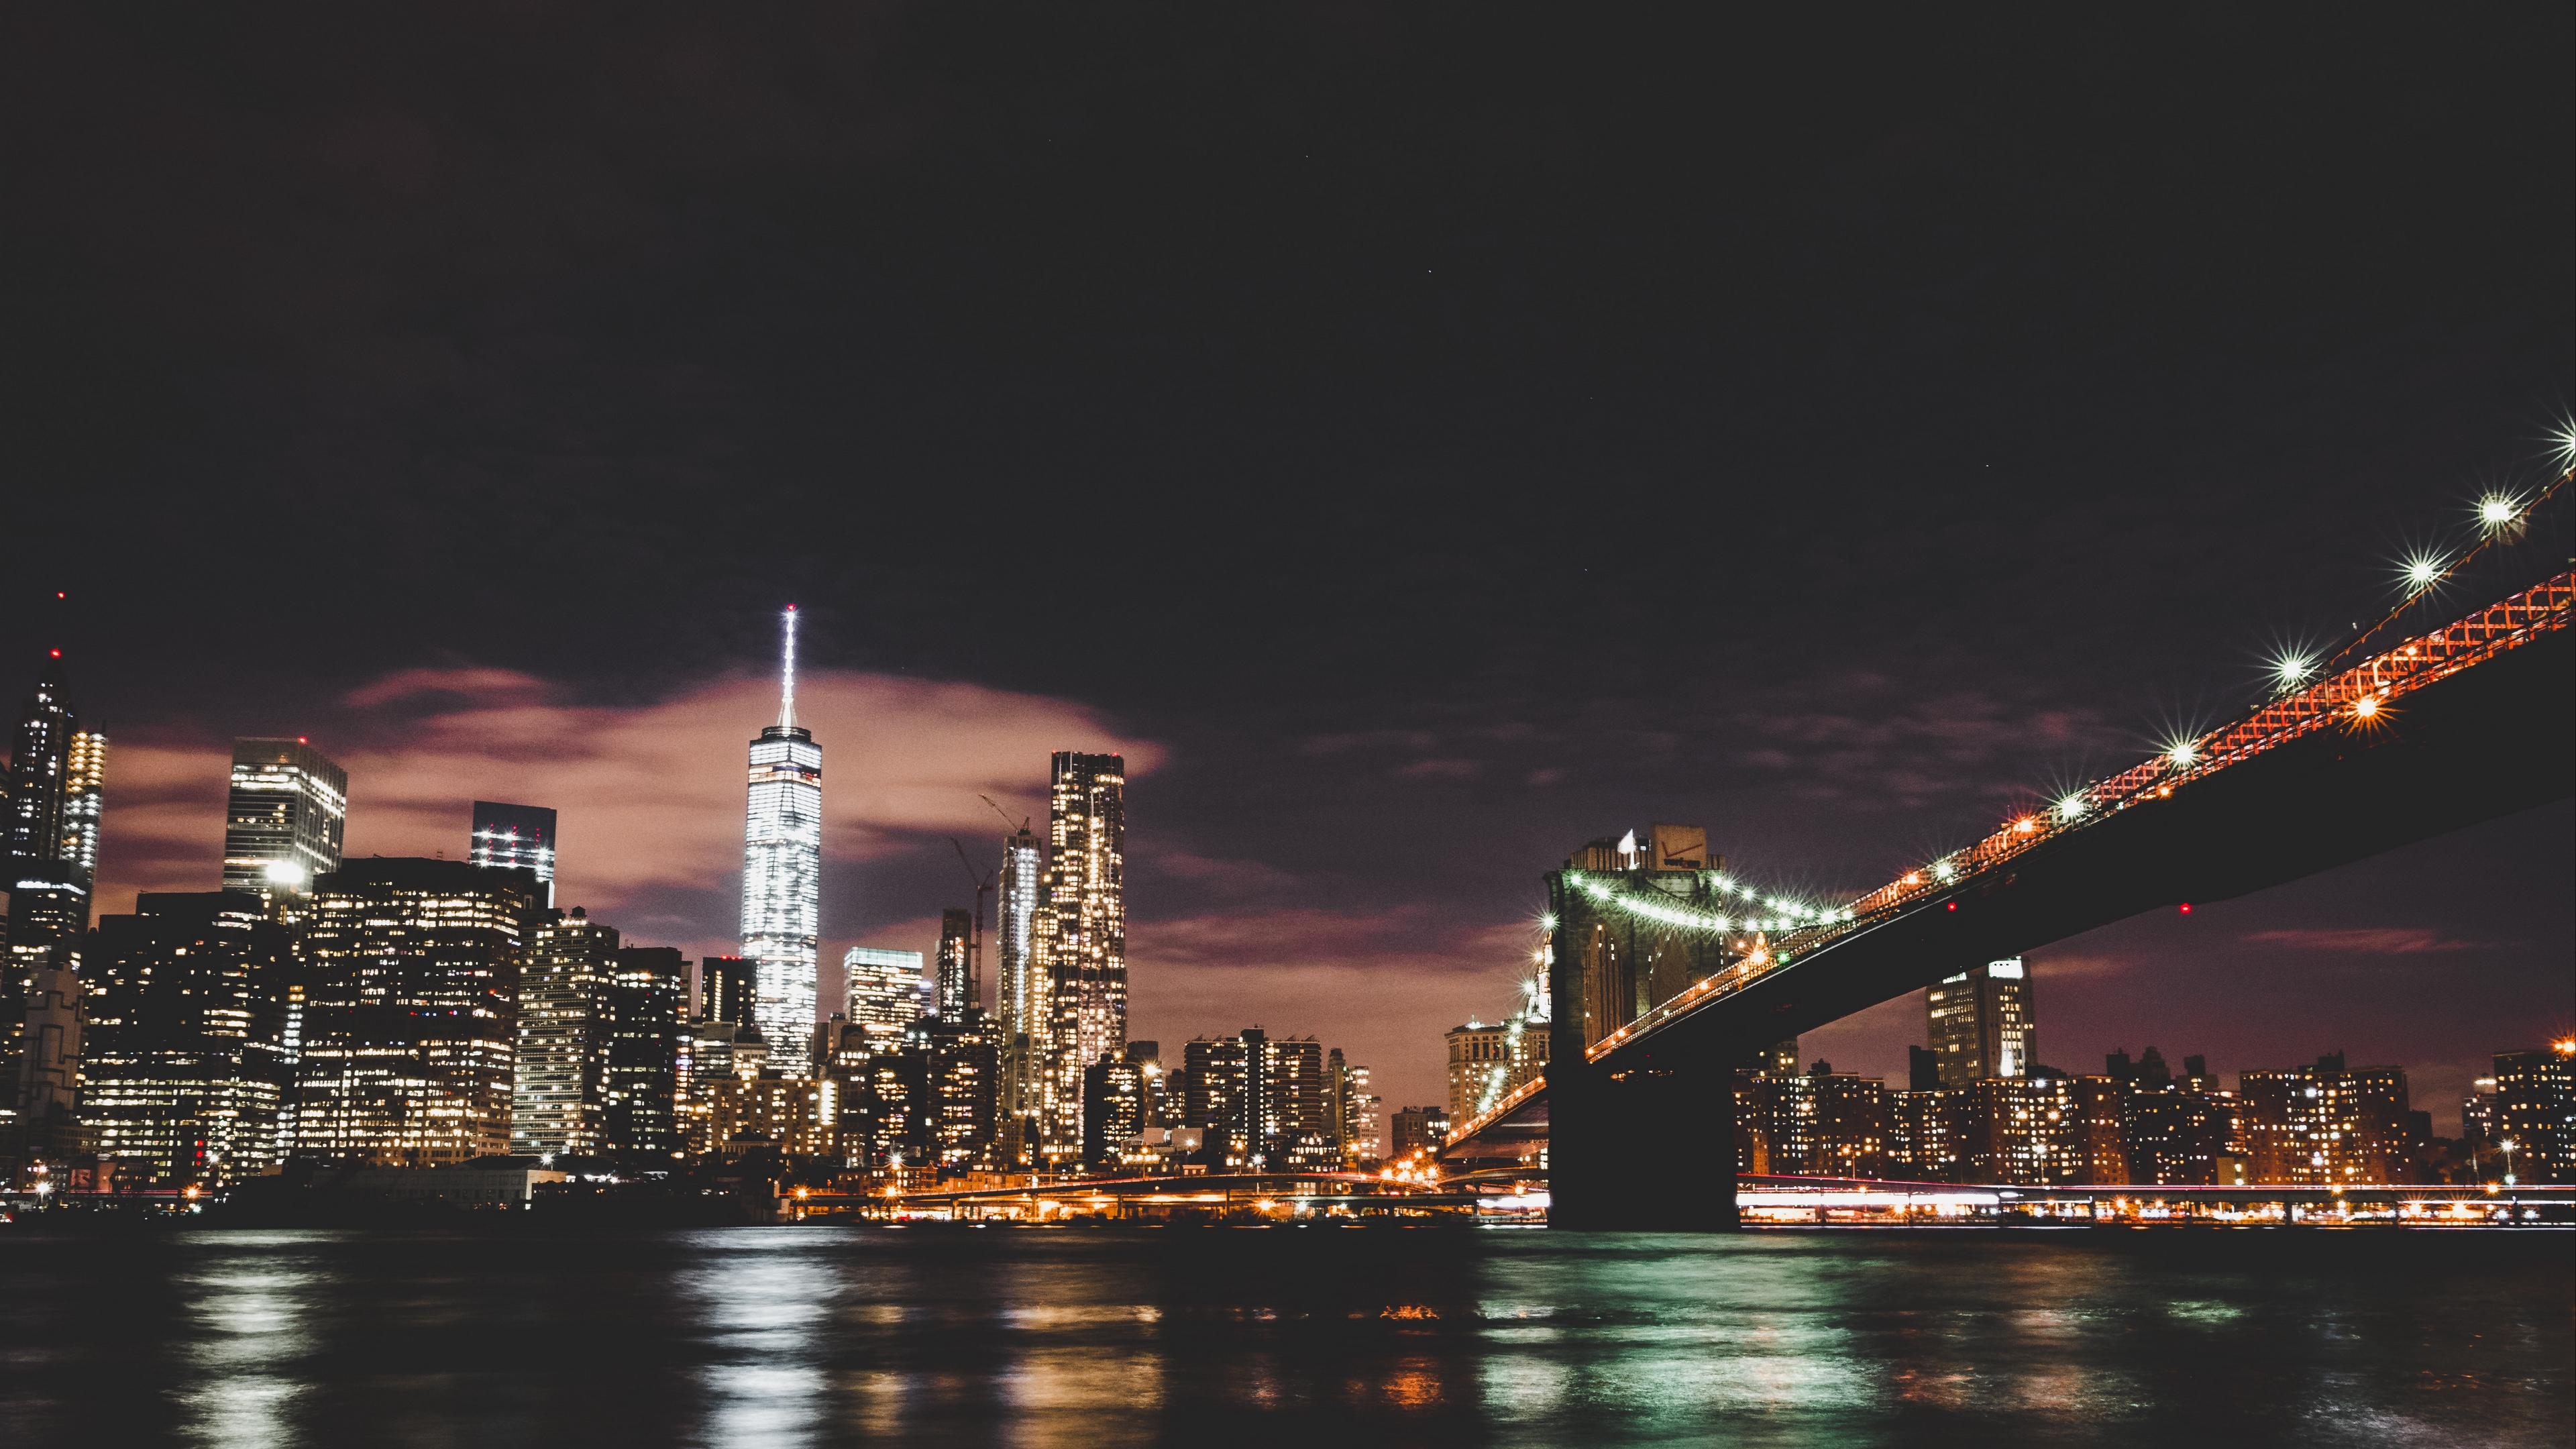 brooklyn usa night city bridge 4k 1538067261 - brooklyn, usa, night city, bridge 4k - USA, night city, Brooklyn